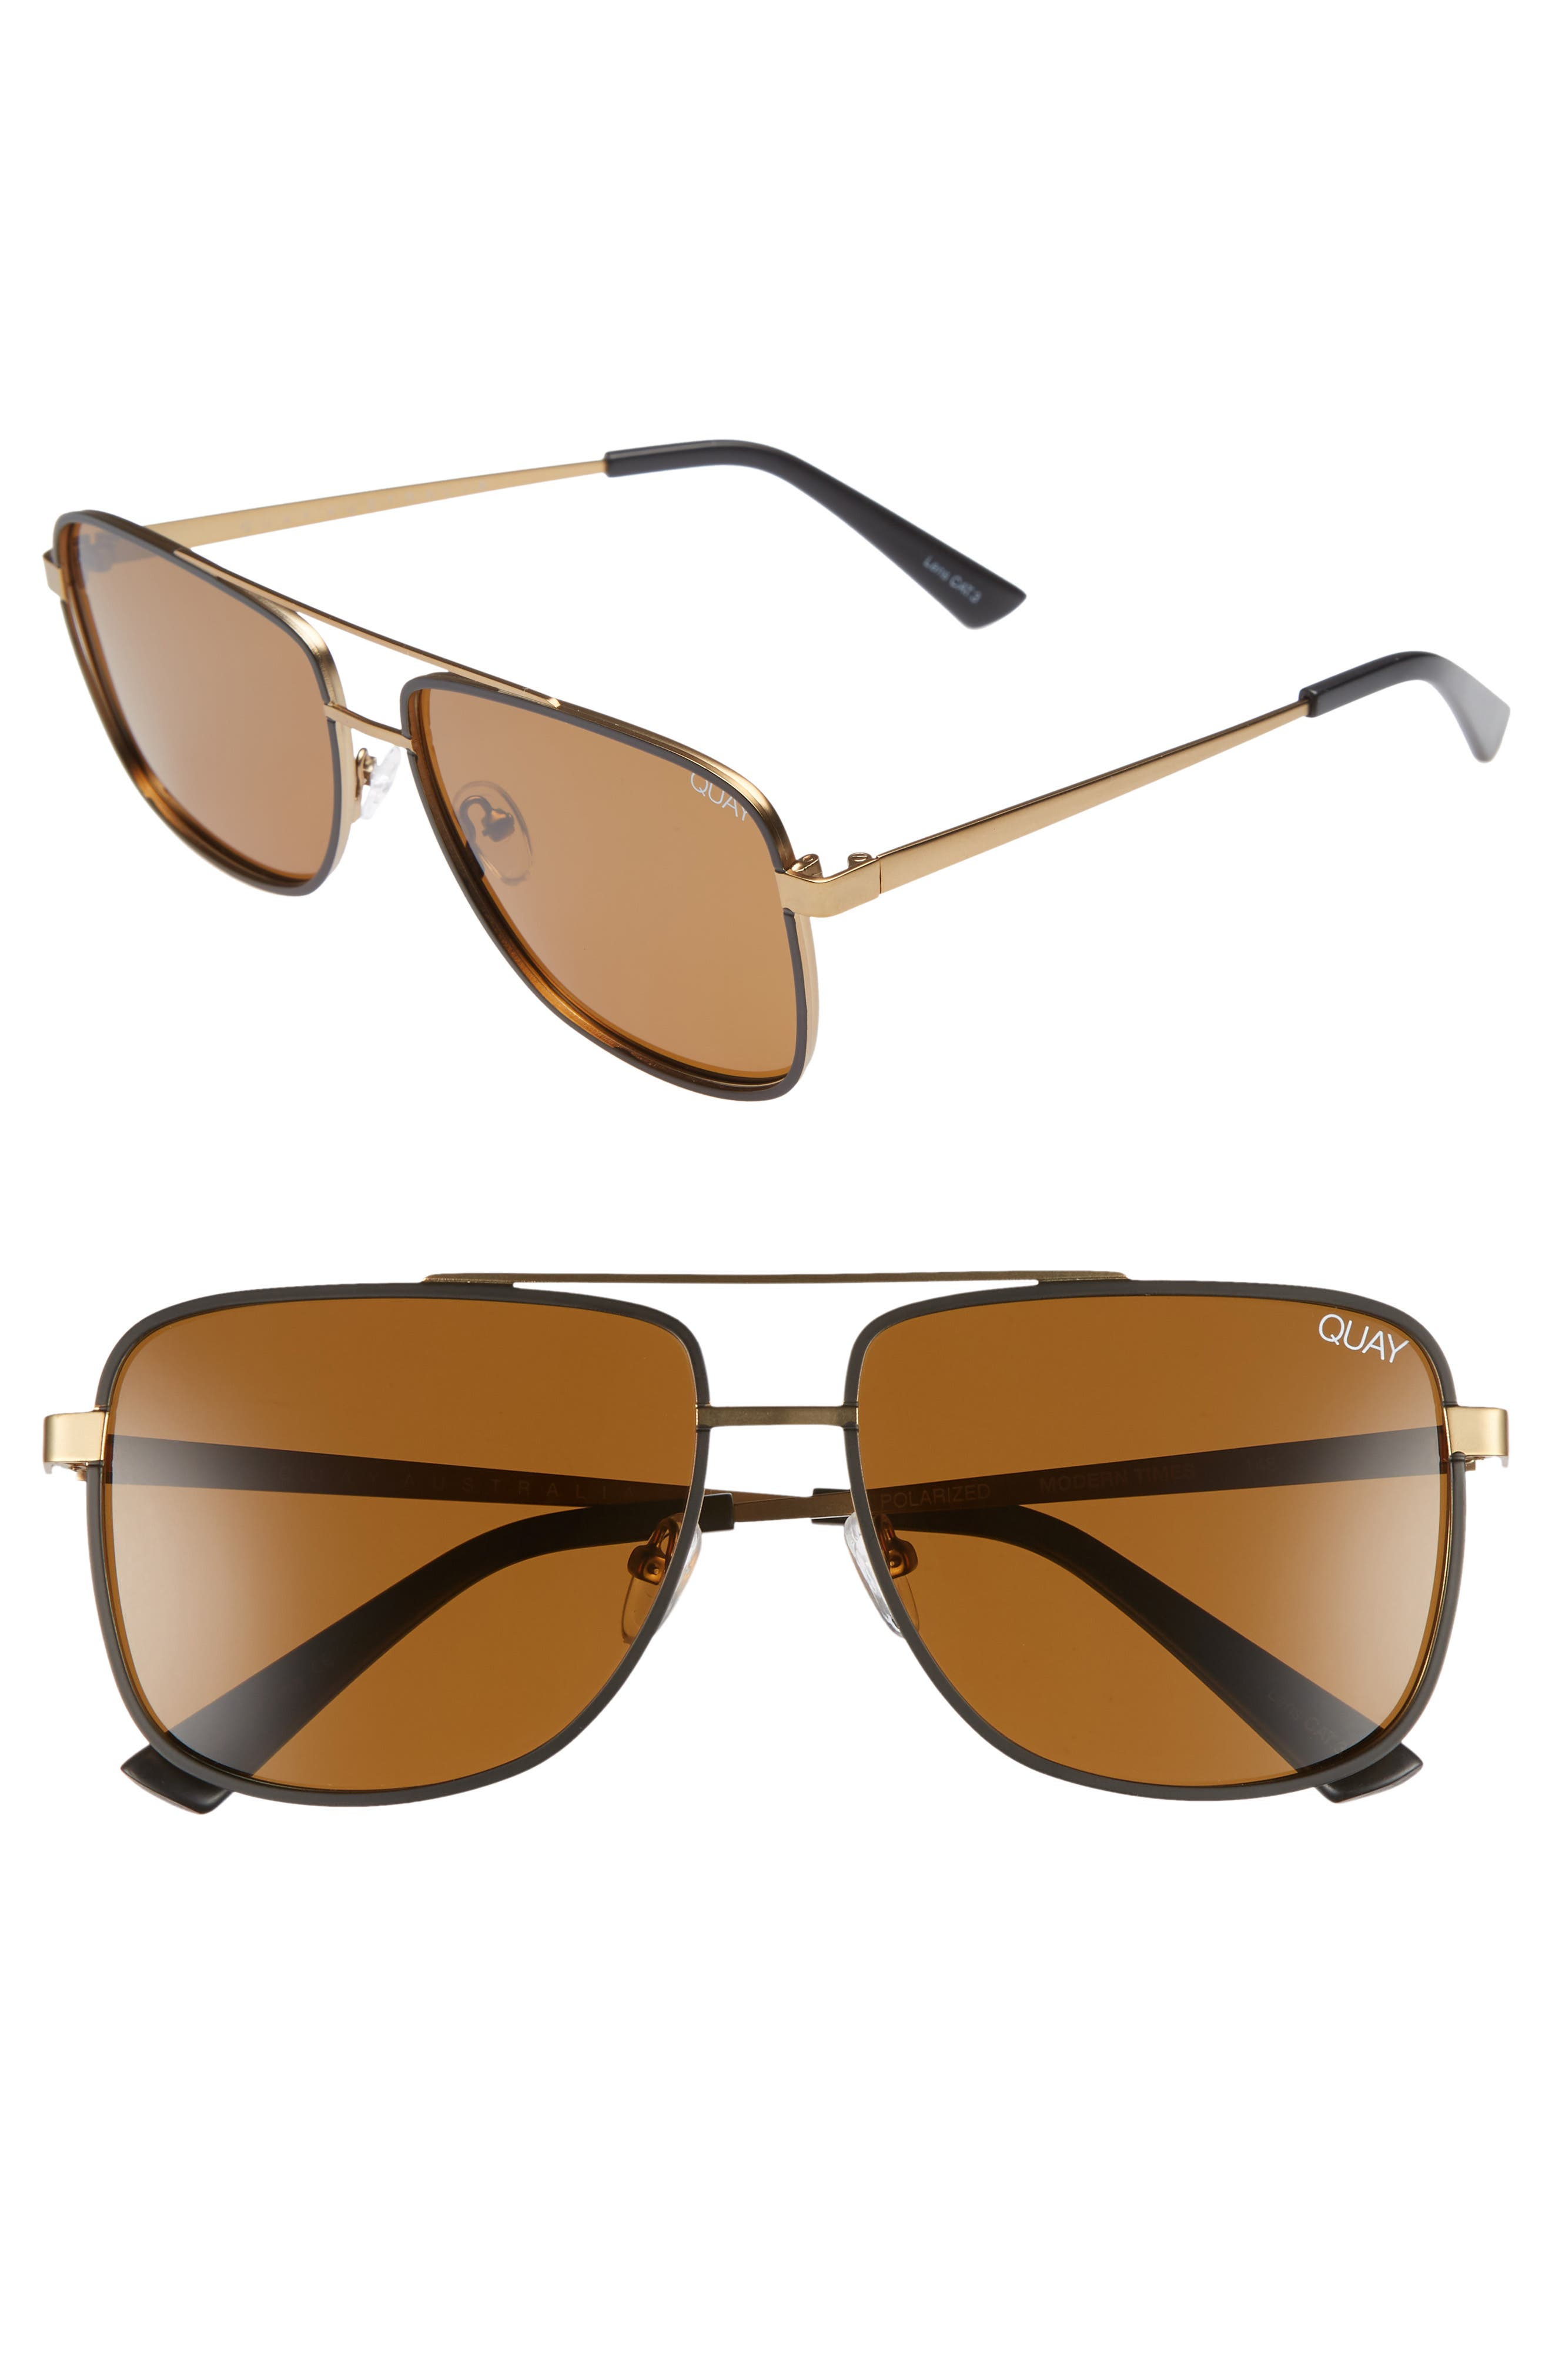 Modern Times 57mm Polarized Aviator Sunglasses,                             Main thumbnail 1, color,                             BRONZE BLACK / BROWN LENS